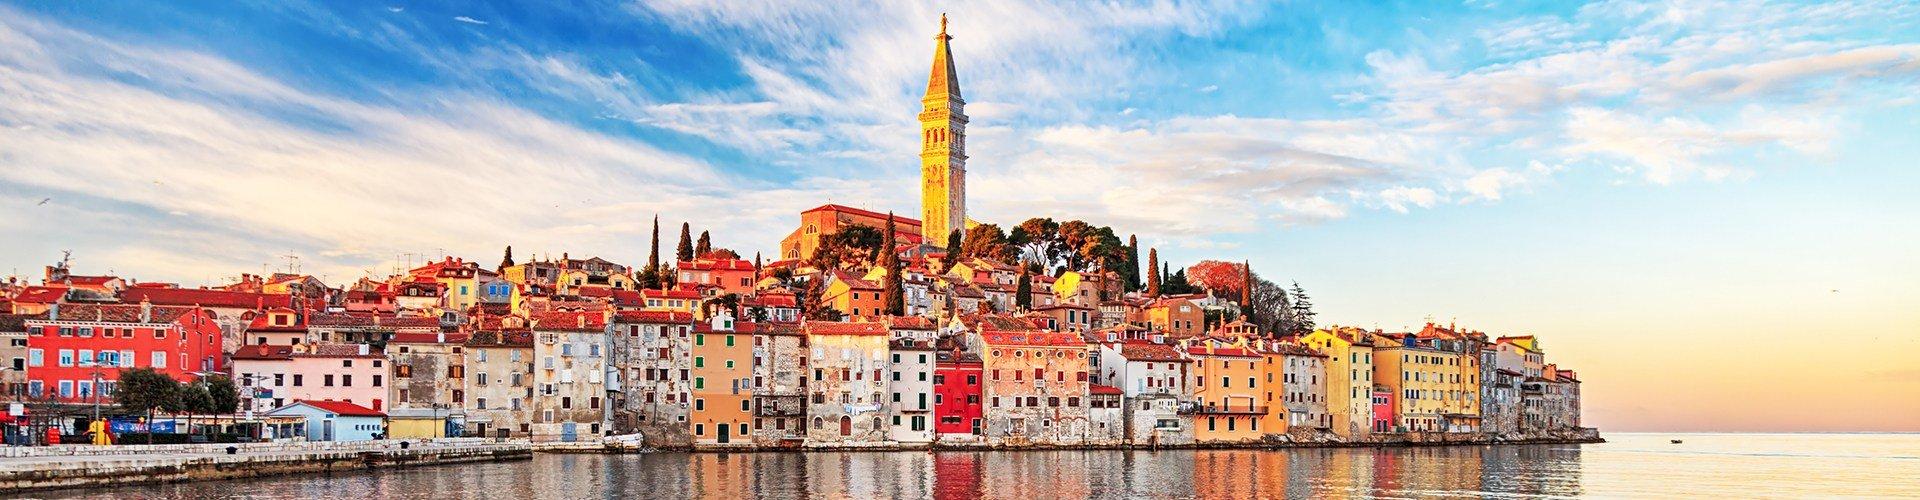 Familienurlaub in Istrien